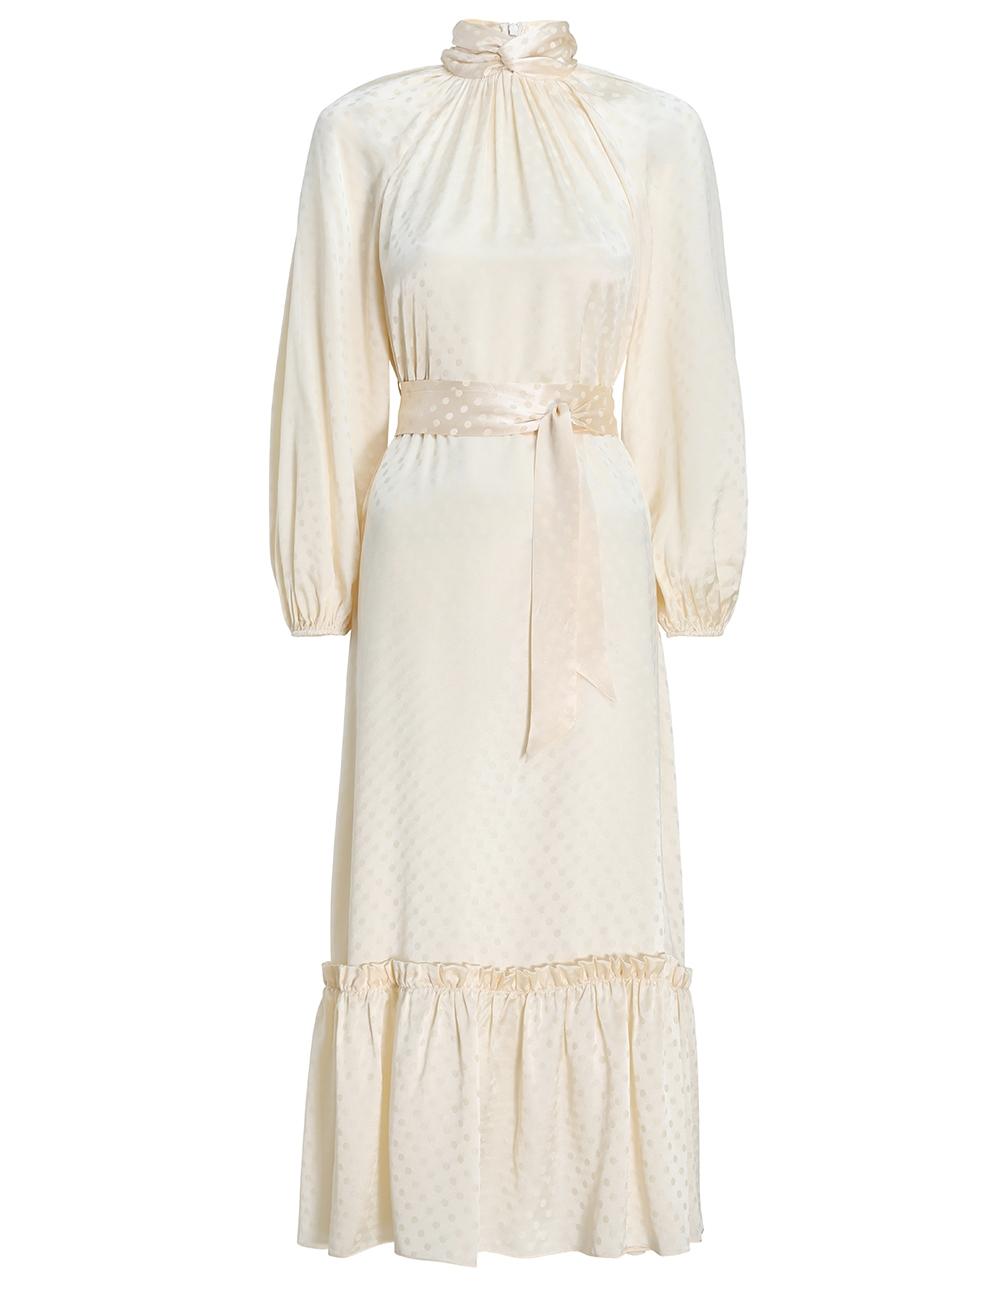 Wavelength Twist Neck Dress